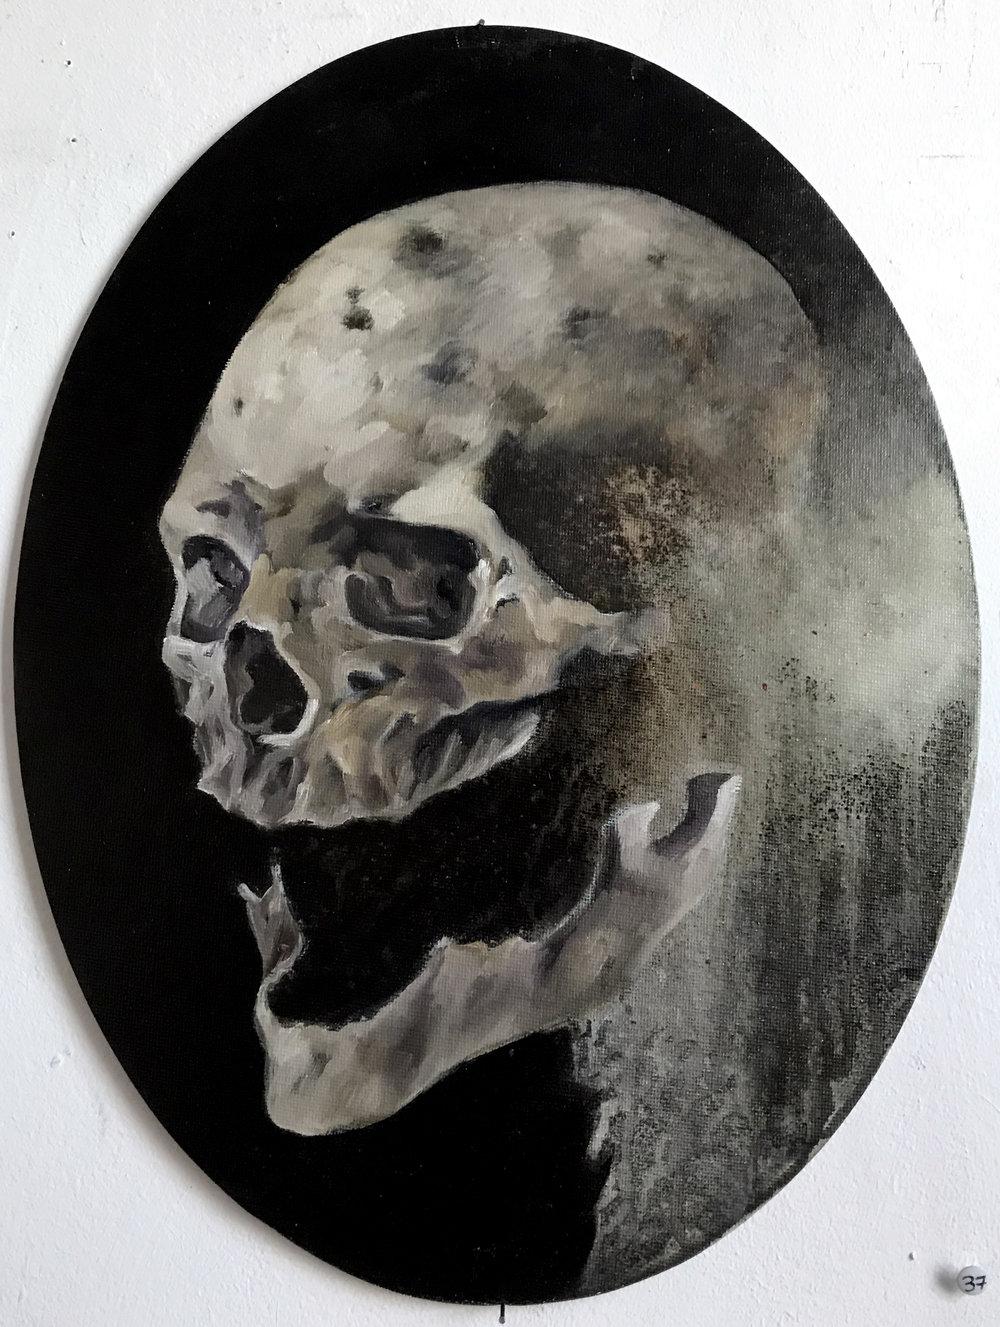 Fragogna_Oval_Skull_Oil on Museum Board_approx 15.5 x 12.jpg